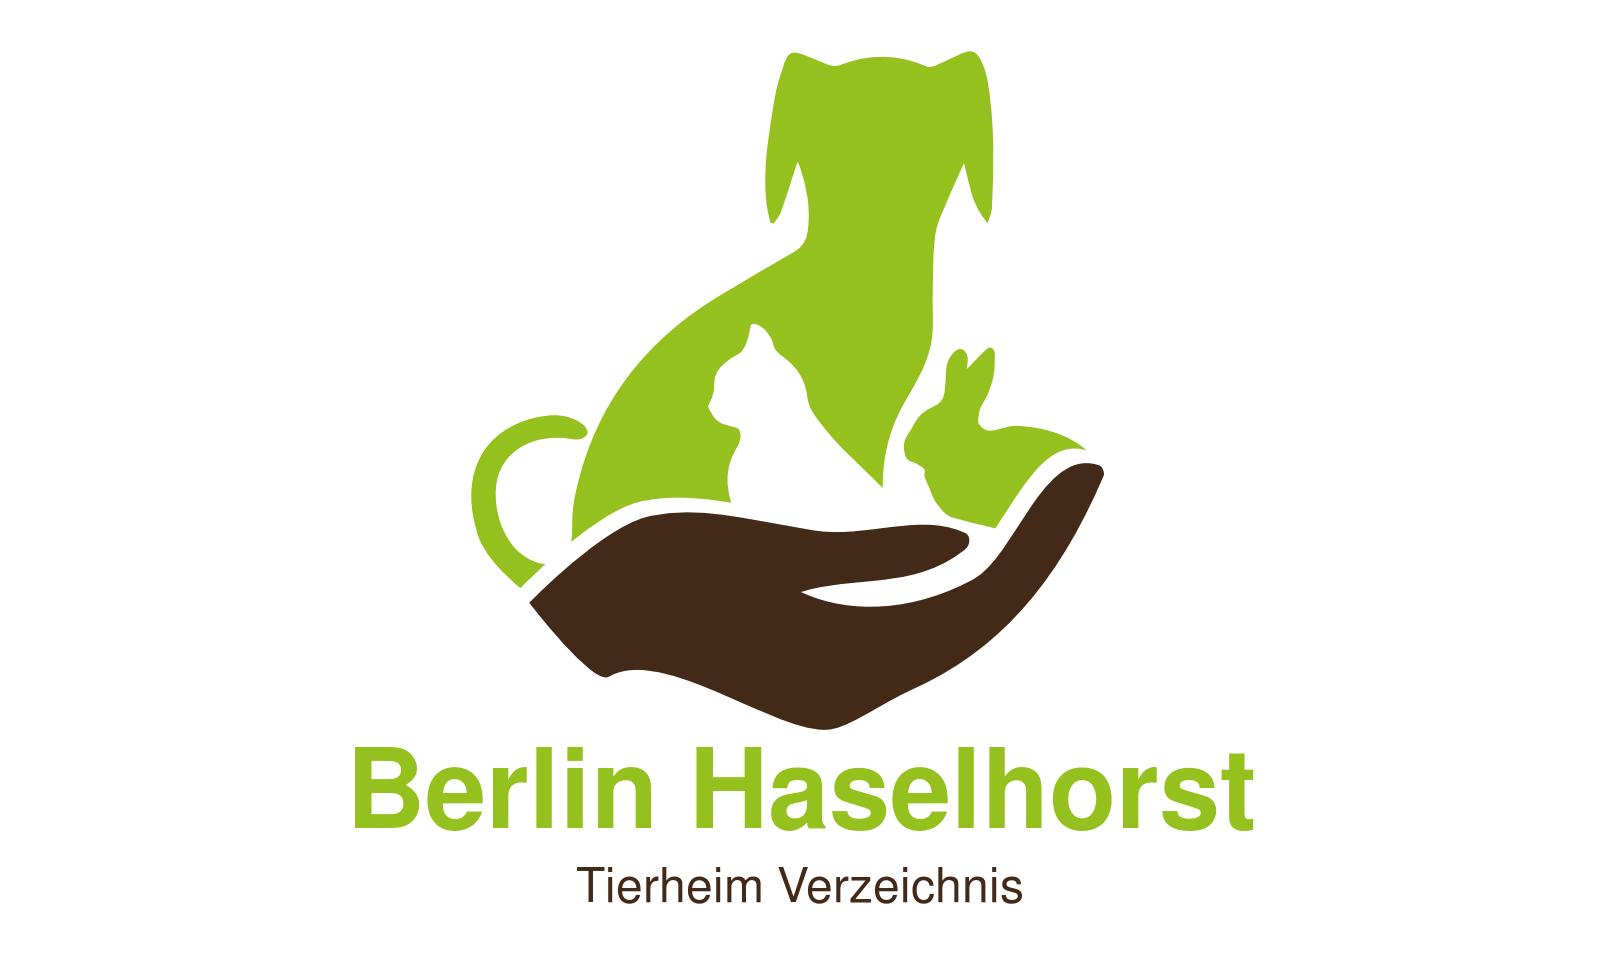 Tierheim Berlin Haselhorst